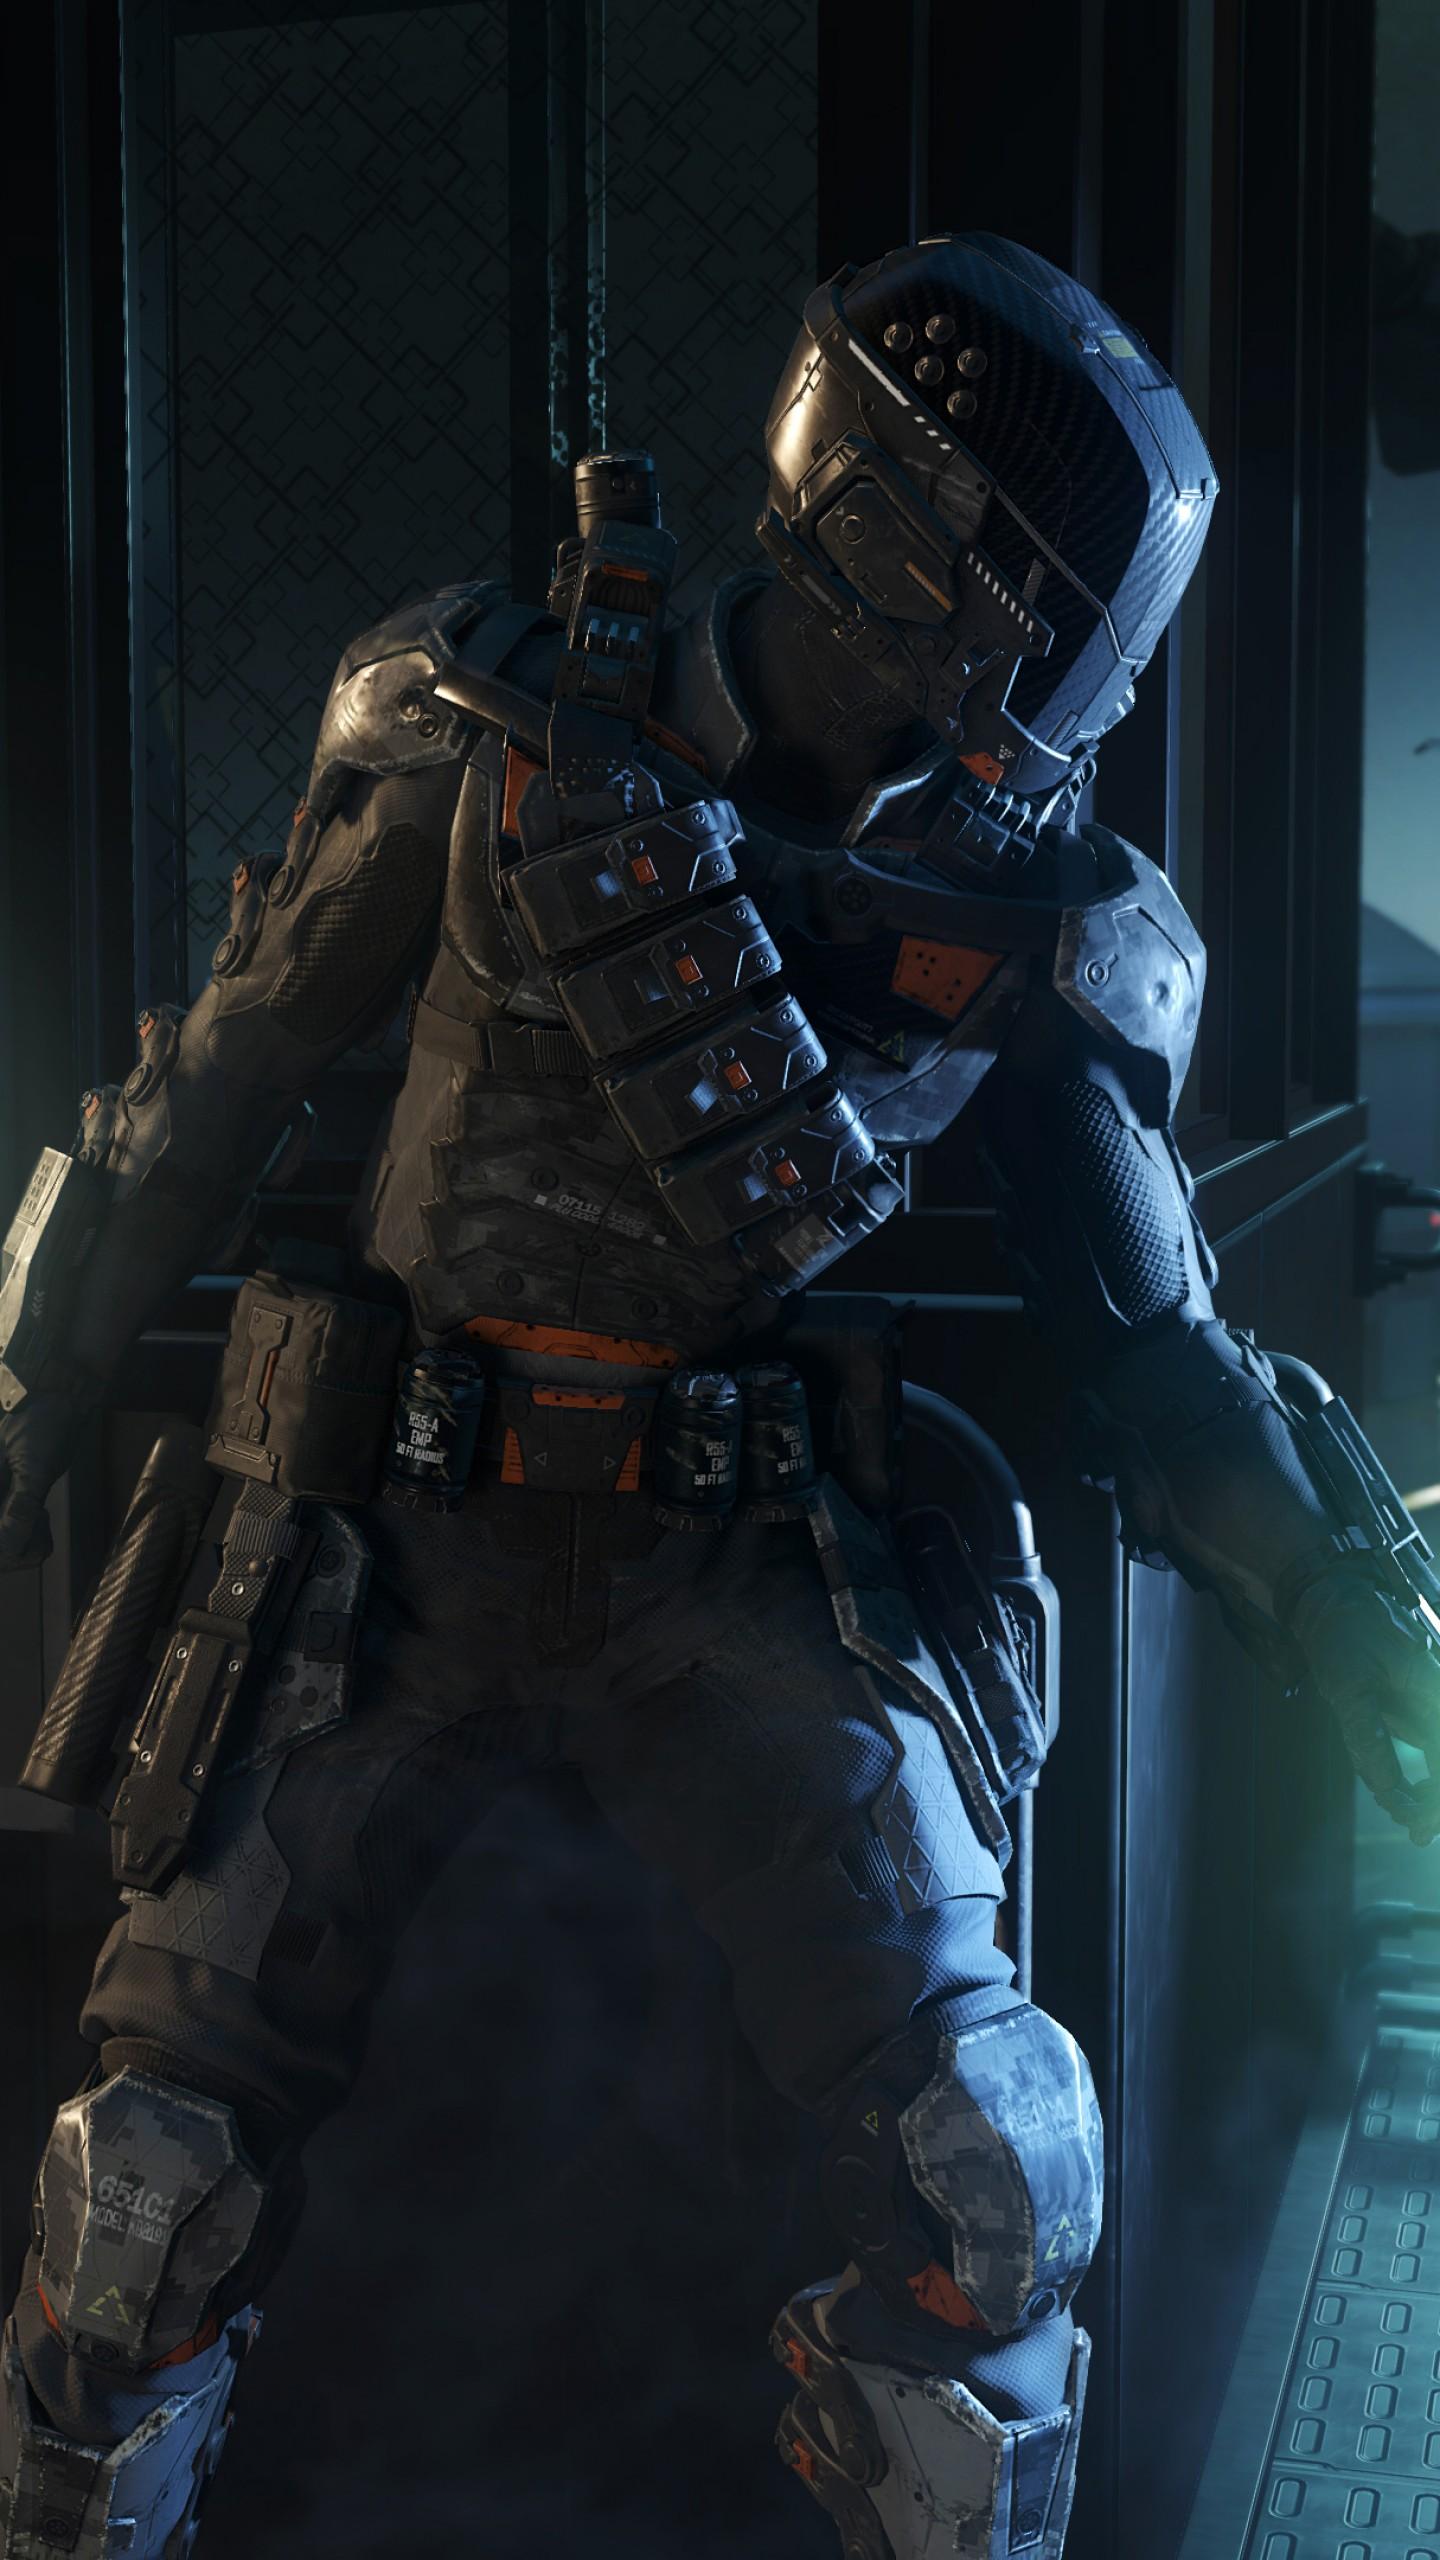 Wallpaper Call Of Duty Black Ops 3 Best Games Sci Fi Fps